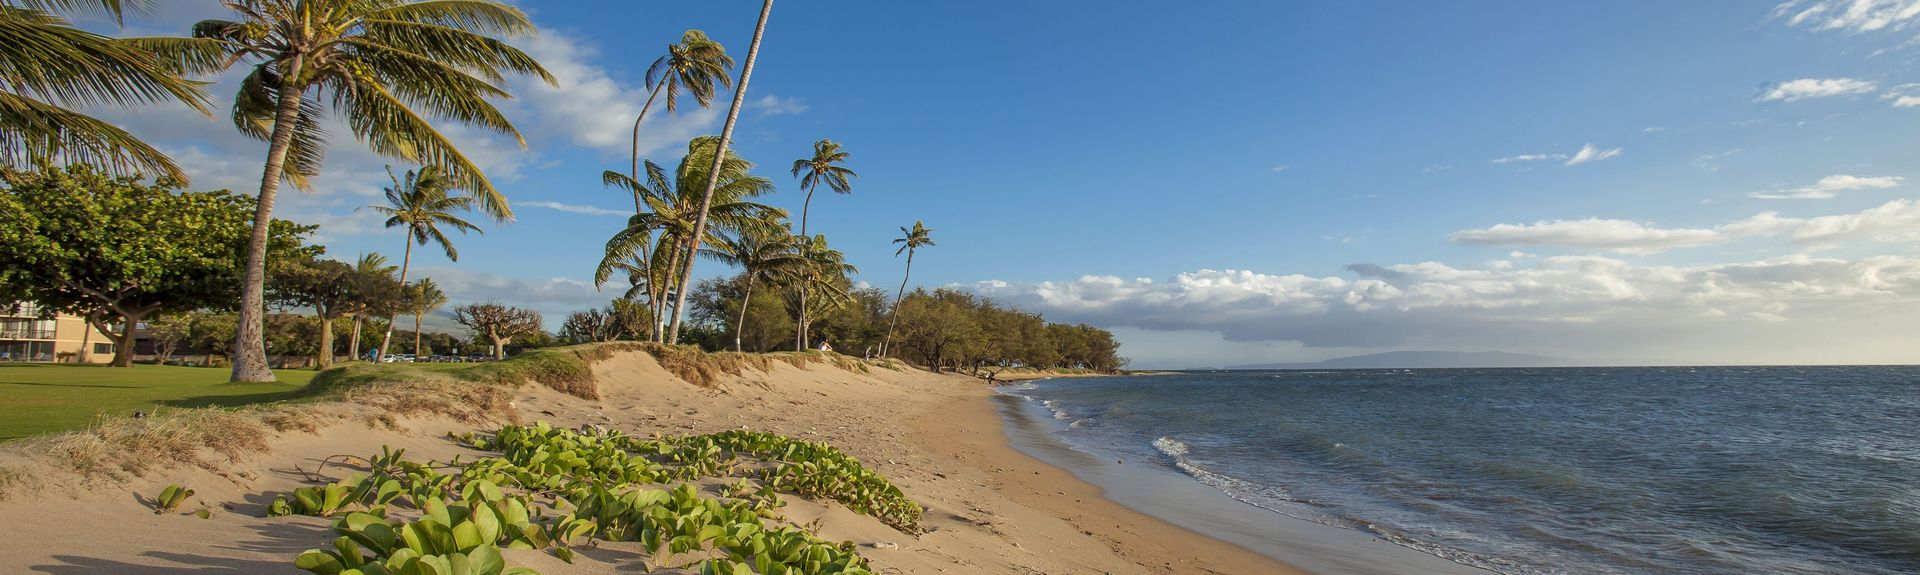 Maui Sunset (Kihei, Hawaii, United States)